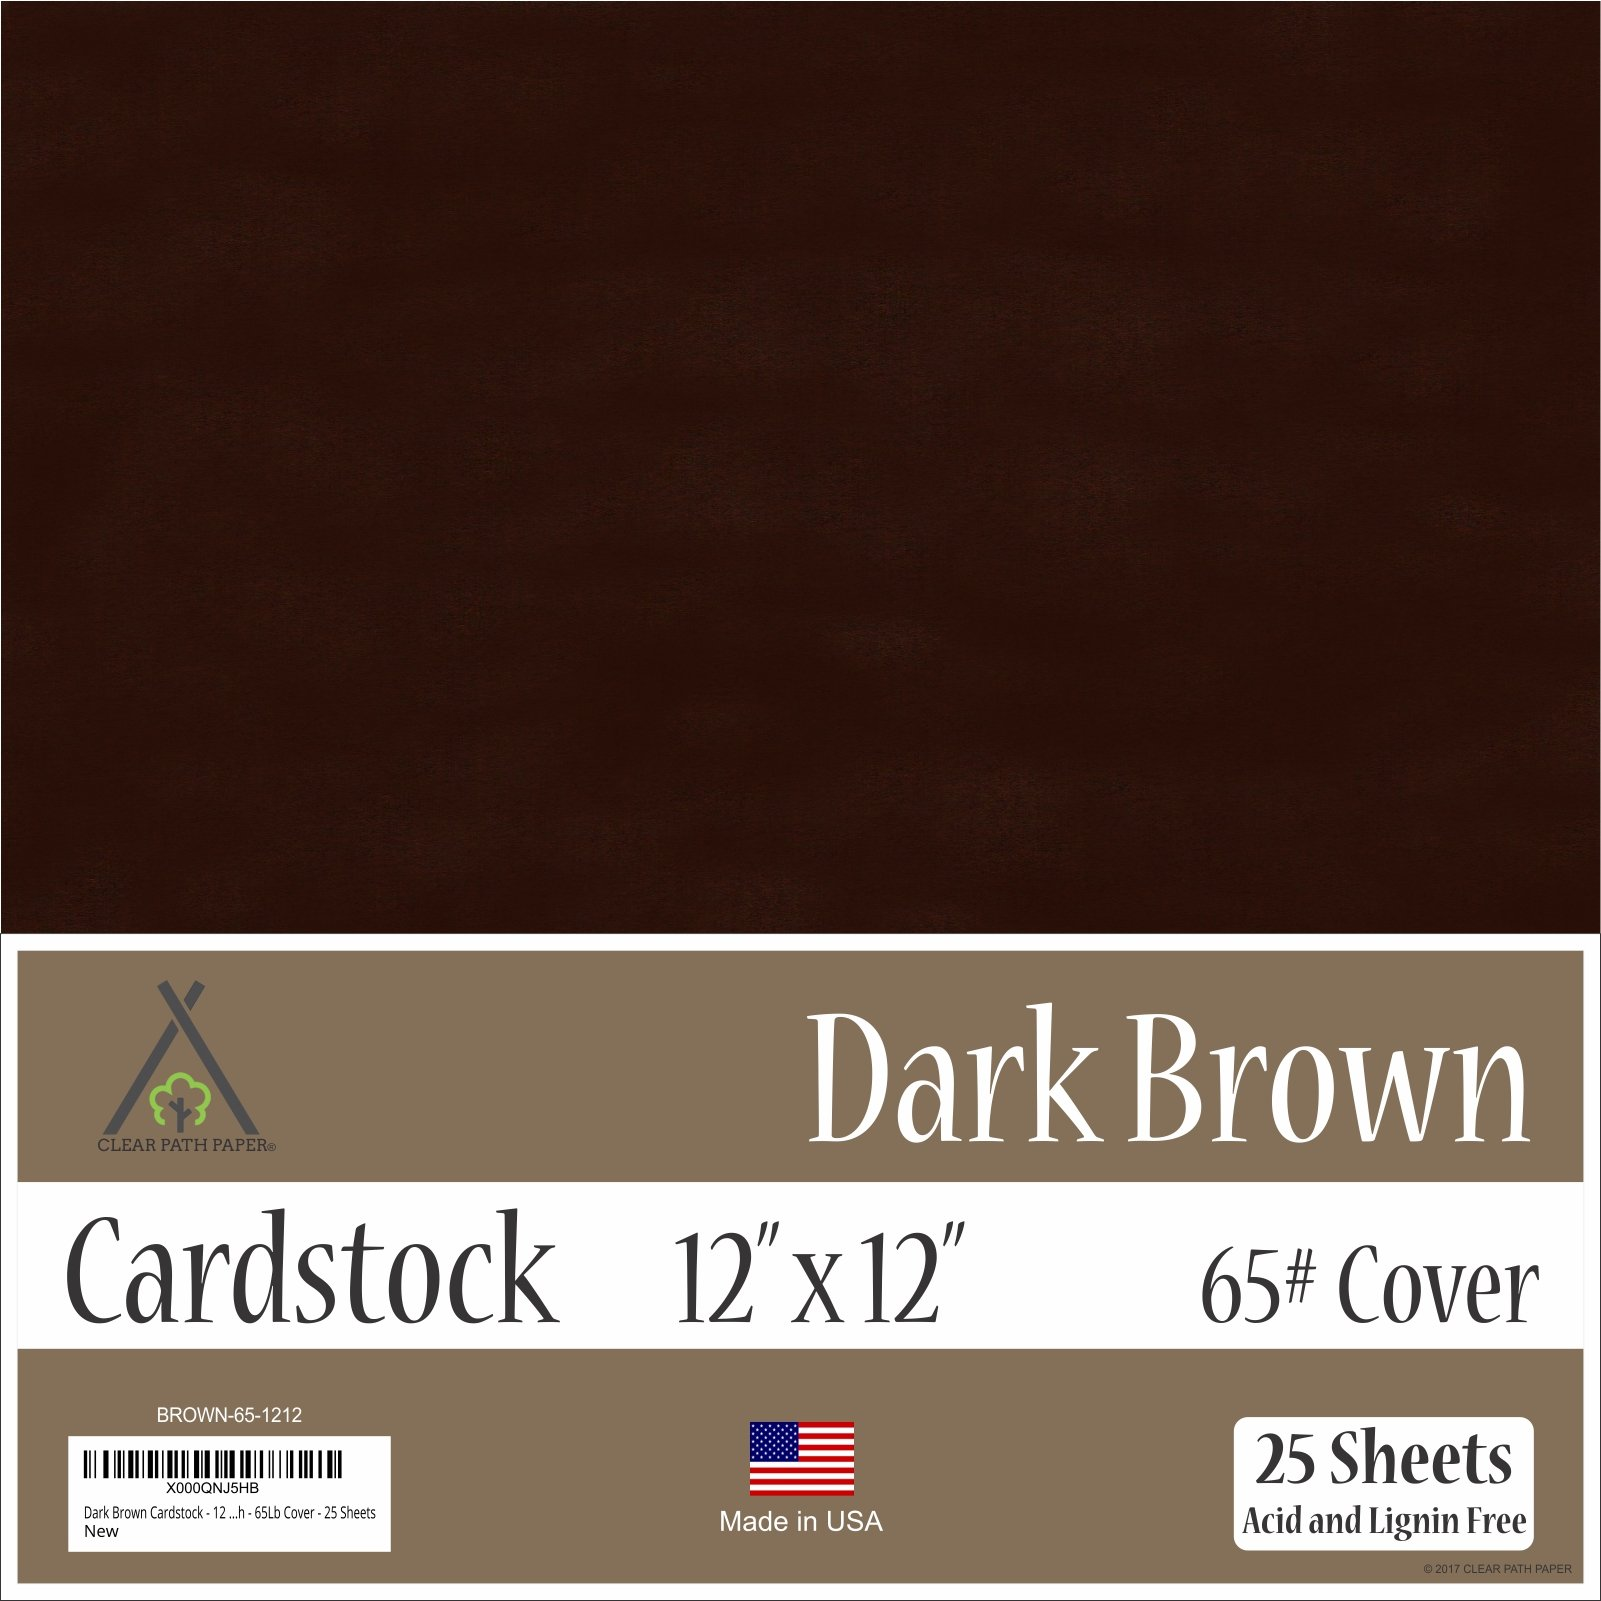 Dark Brown Cardstock - 12 x 12 inch - 65Lb Cover - 25 Sheets